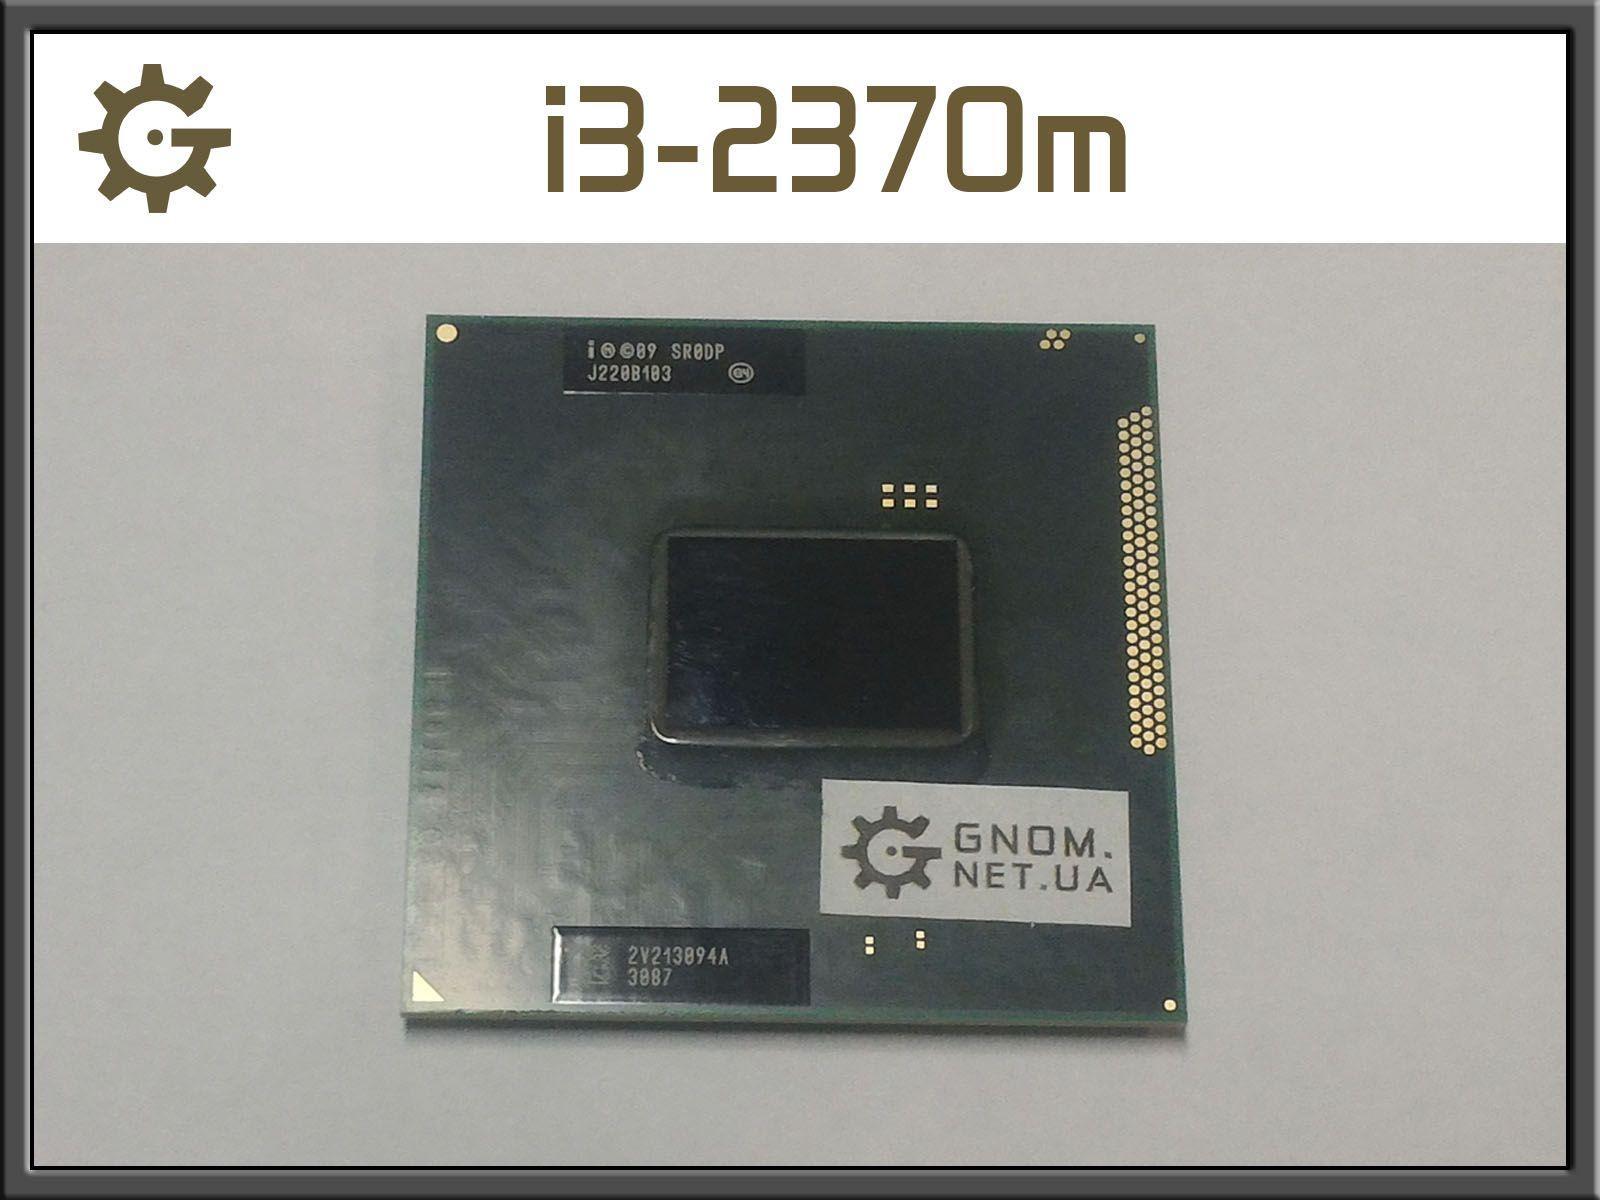 Процессор Intel Core i3-2370m ноутбук 2,4 Ghz Socket G2 SR0DP Sandy